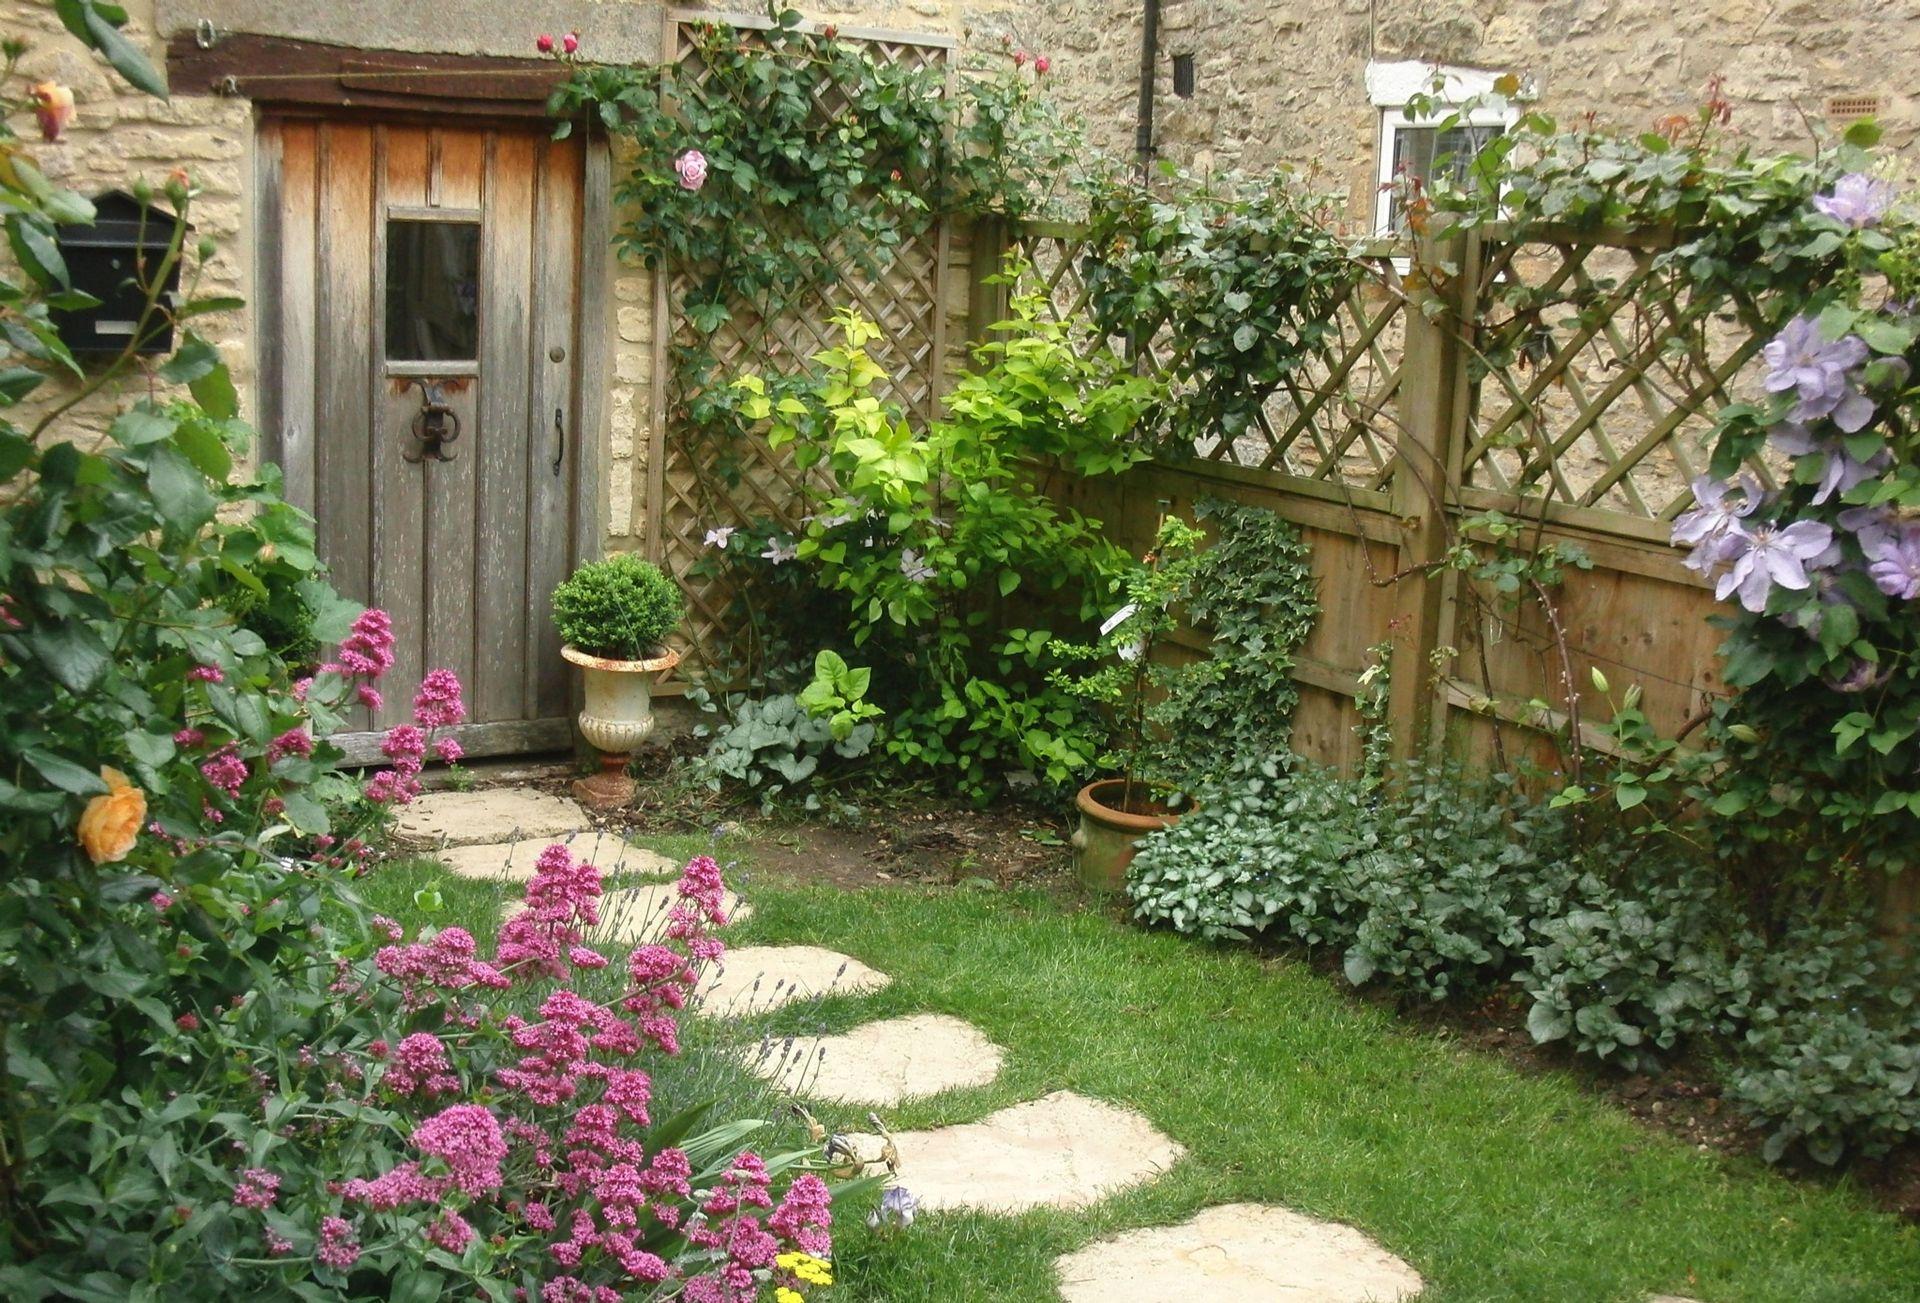 Delightful small garden